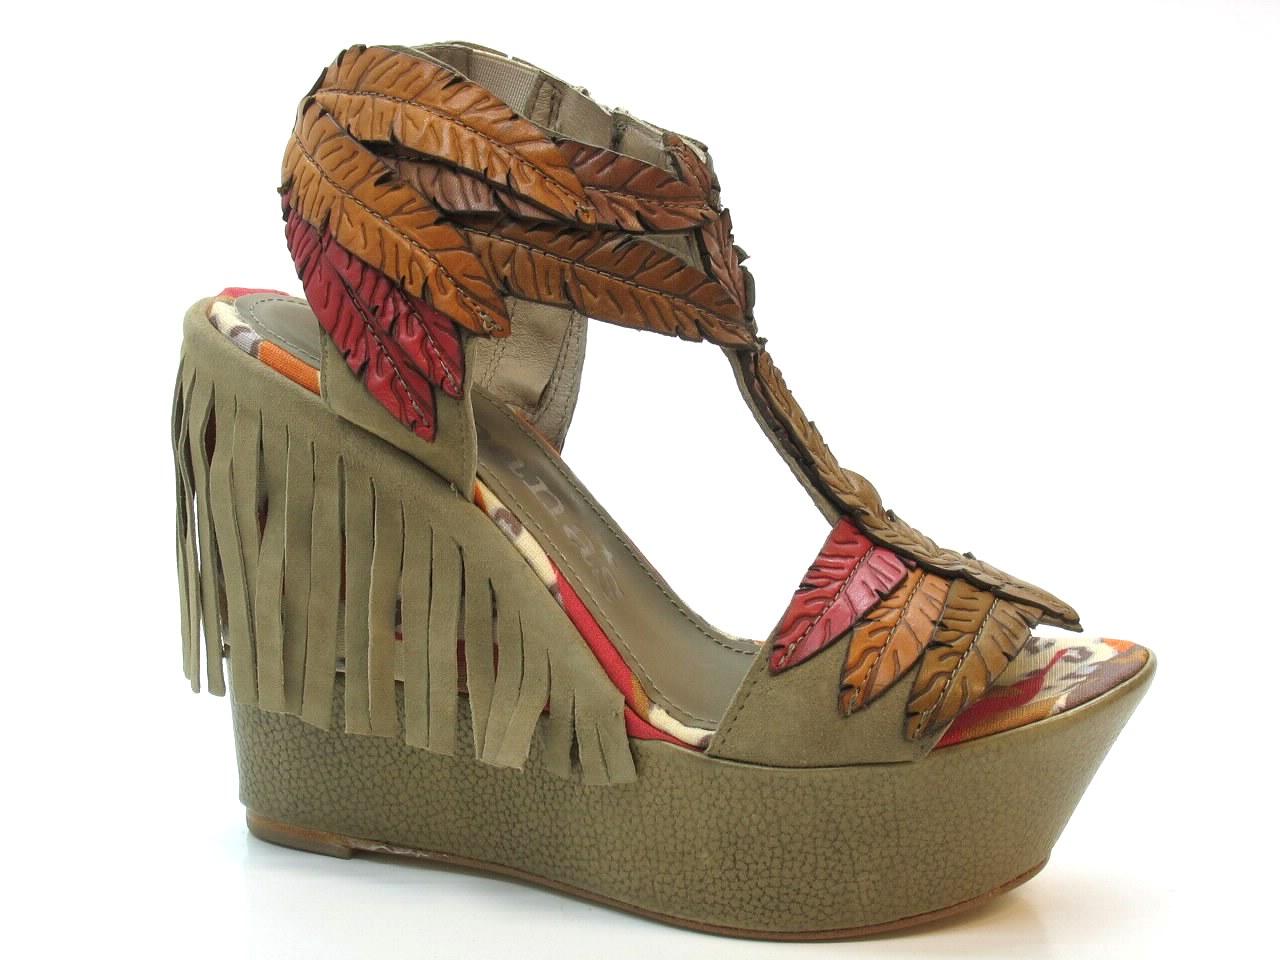 Wedge Sandals Cubanas - 334 SLIM330